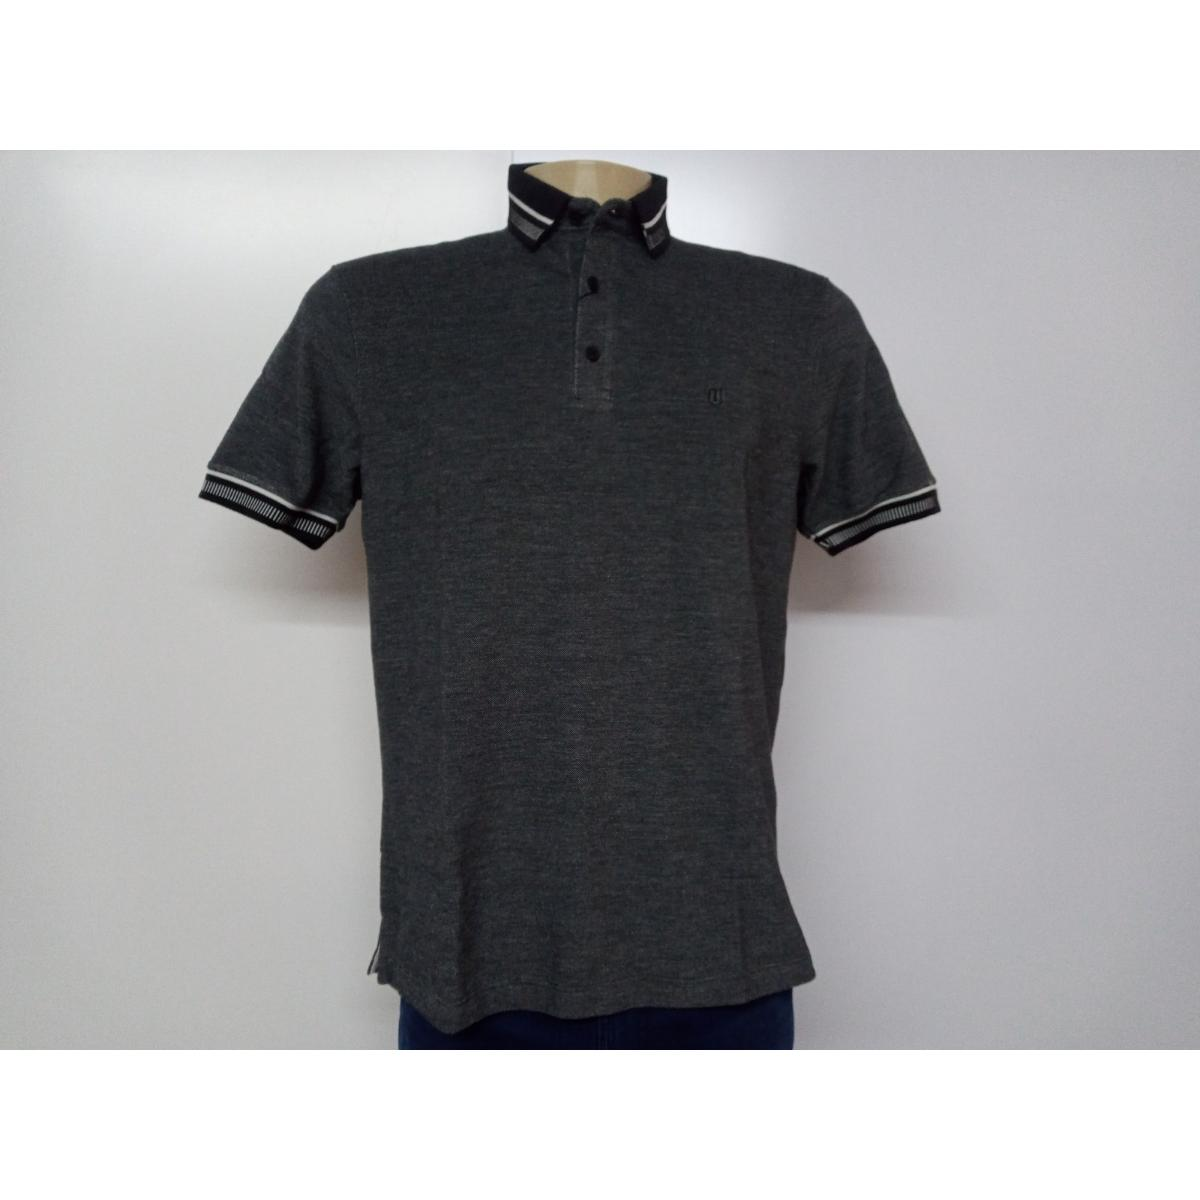 Camiseta Masculina Individual 08.75.0817.09 Preto